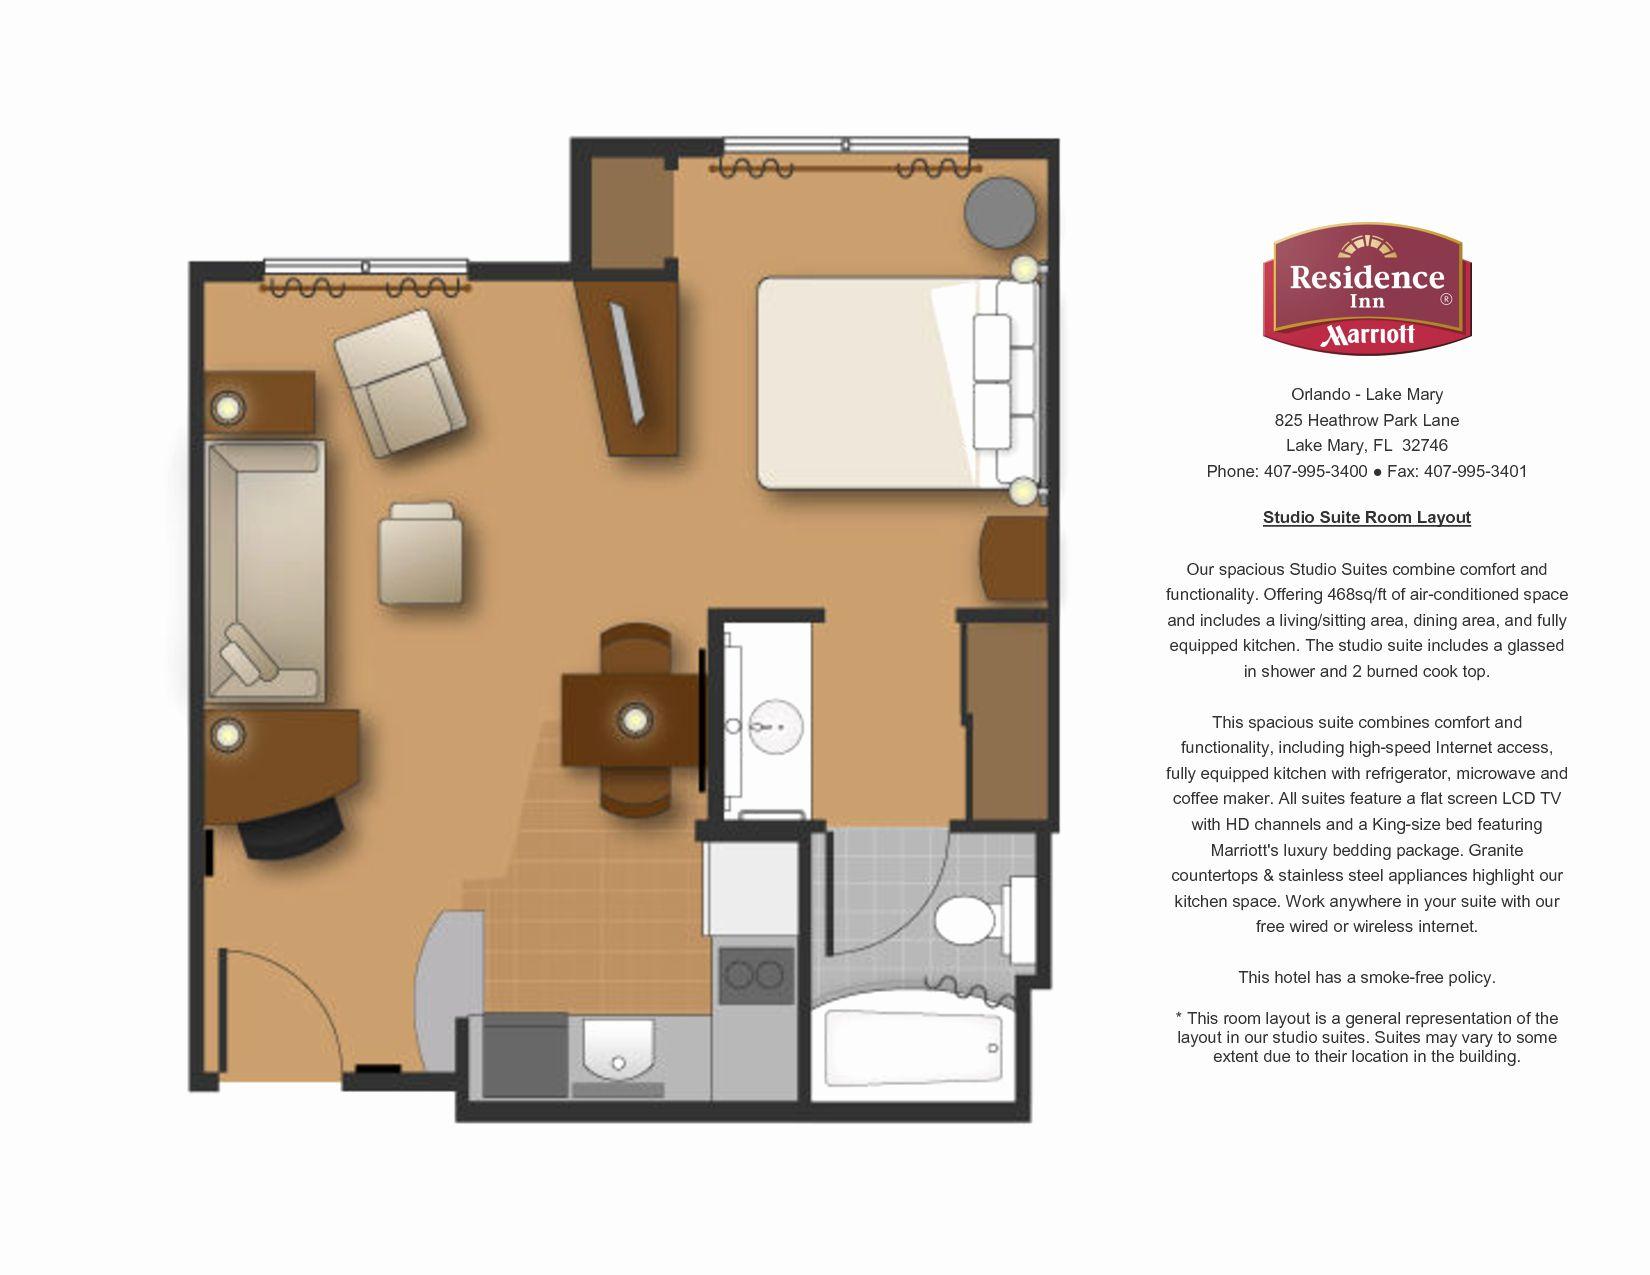 Image Result For Marriott Residence Inn Room Floor Plans Suite Room Layout Planner Bedroom Floor Plans Floor Plans